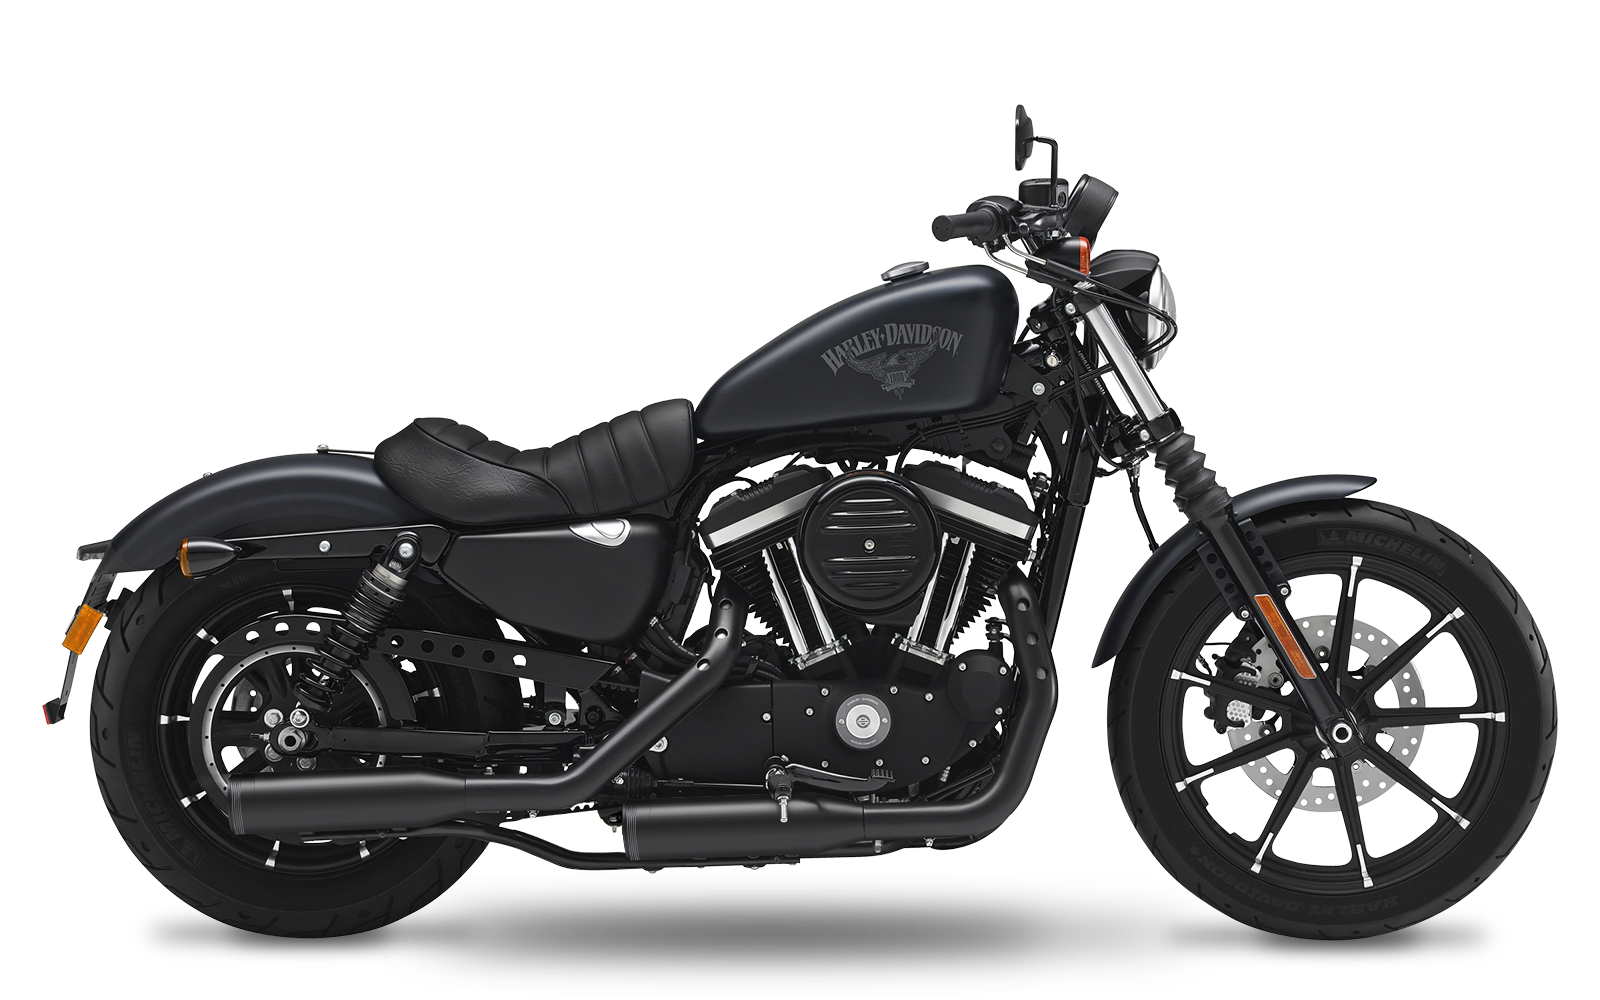 Sportster - Iron 883 - XL - 2017-2020 - Endtöpfe